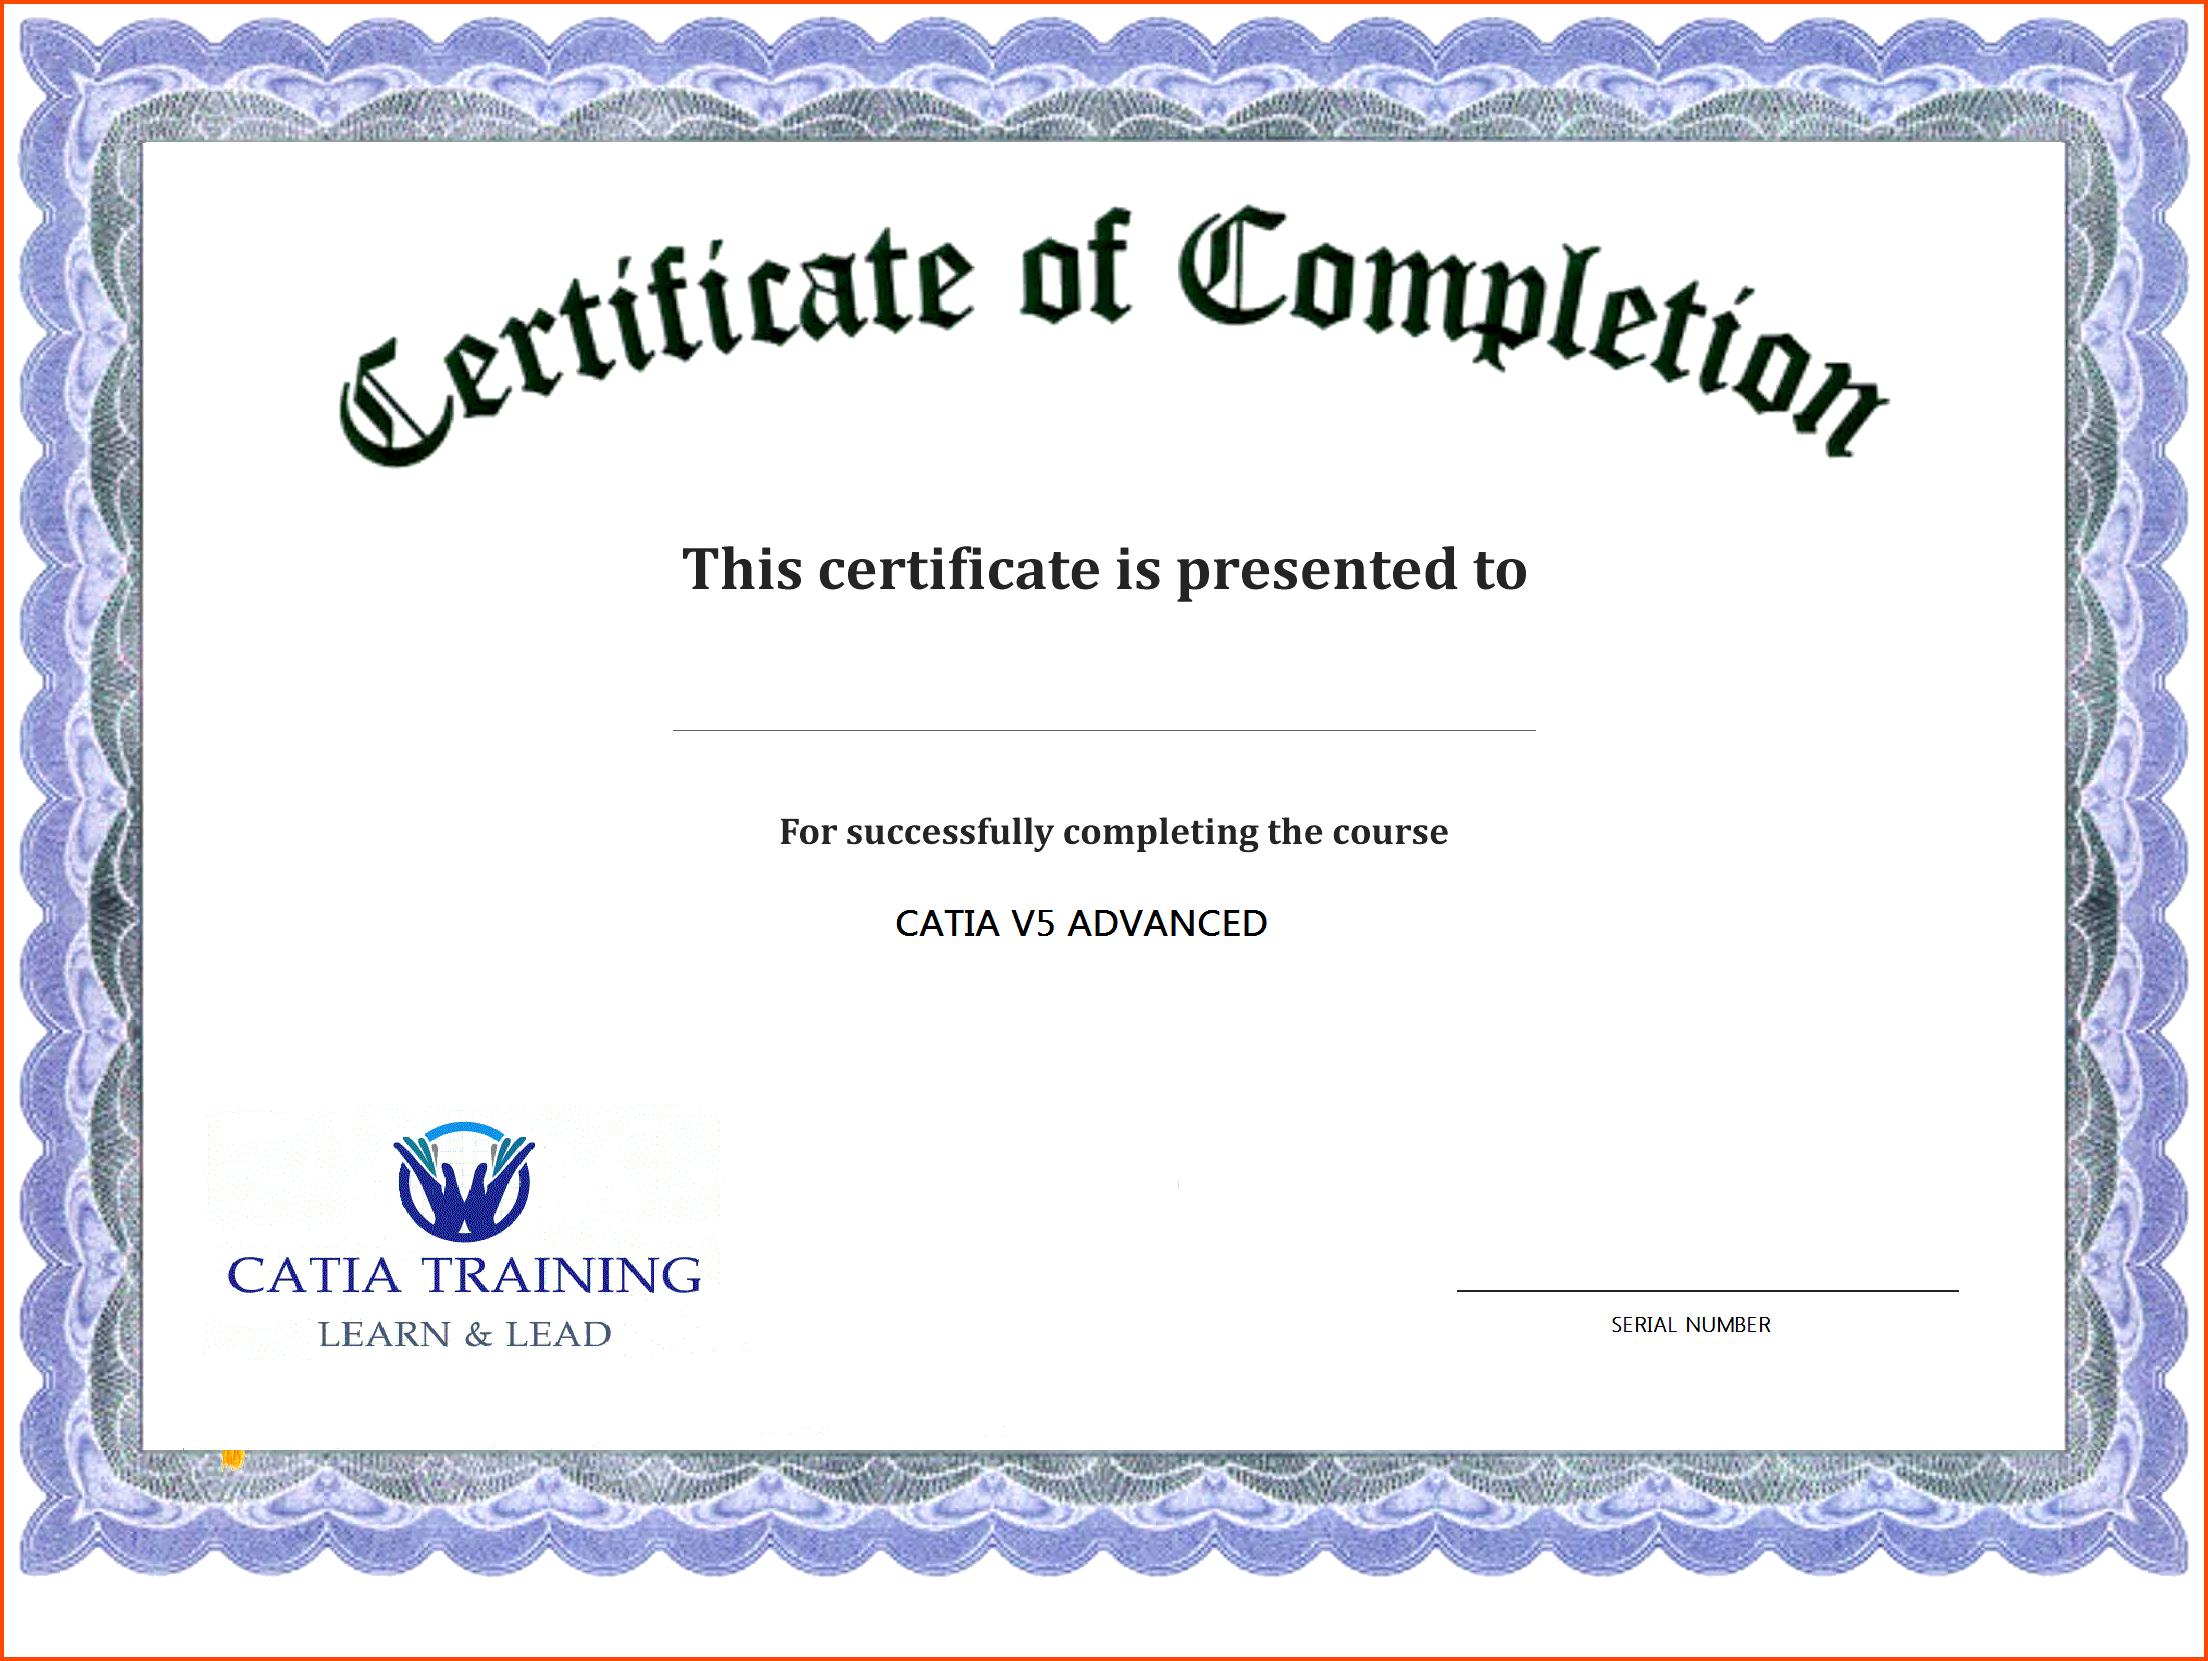 038 Award Certificate Template Word Free Printable Editable For Free Certificate Templates For Word 2007